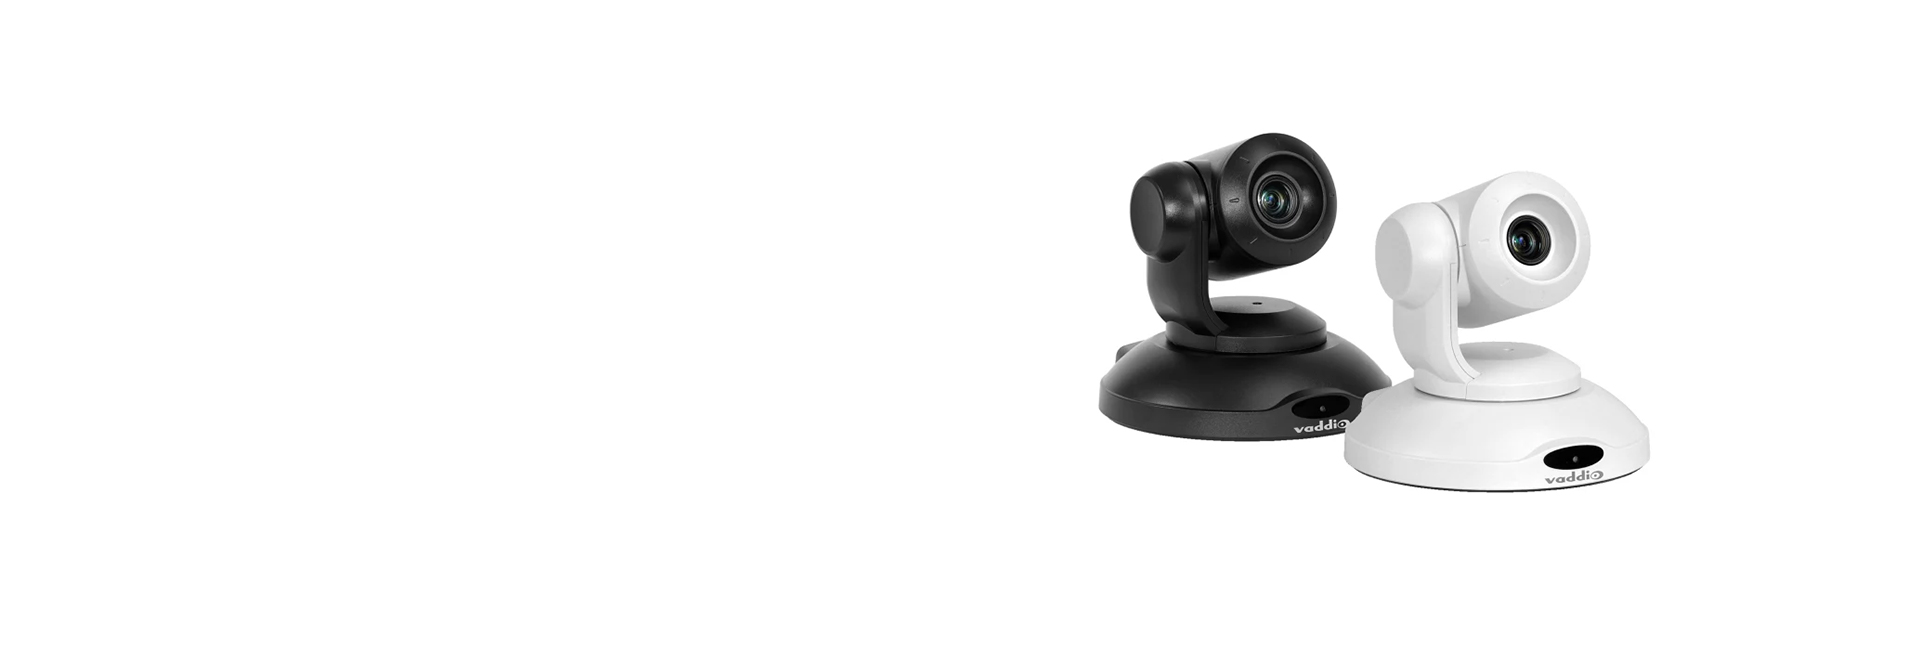 EasyIP 10 Camera